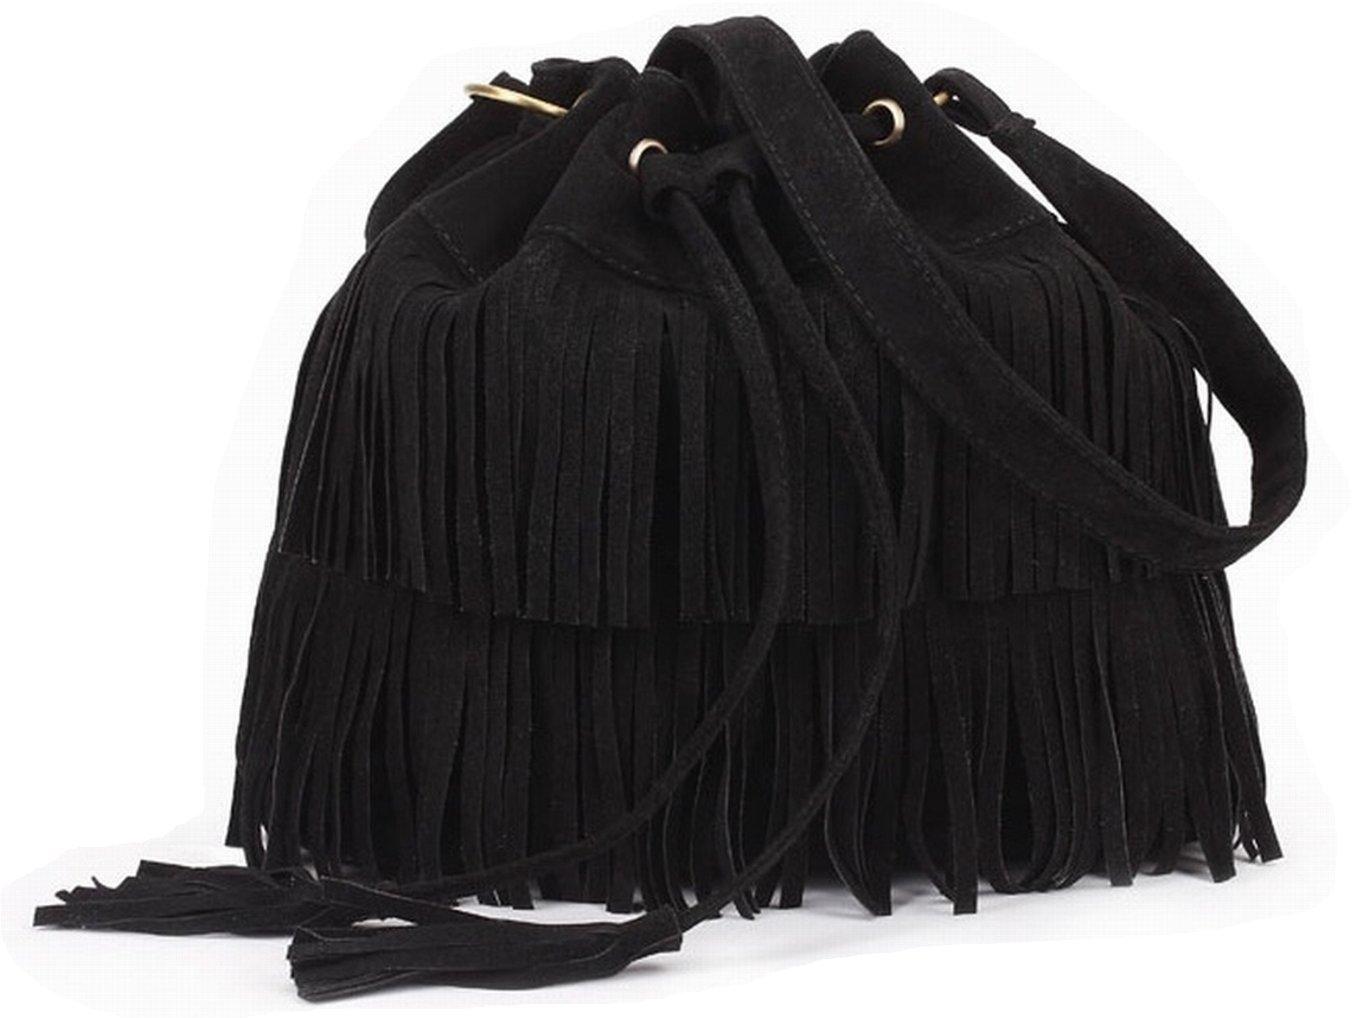 MaDD Stylish Fashionable Womens Cross-body Shoulder Bag Faux Suede Fringe Tassels (Black)